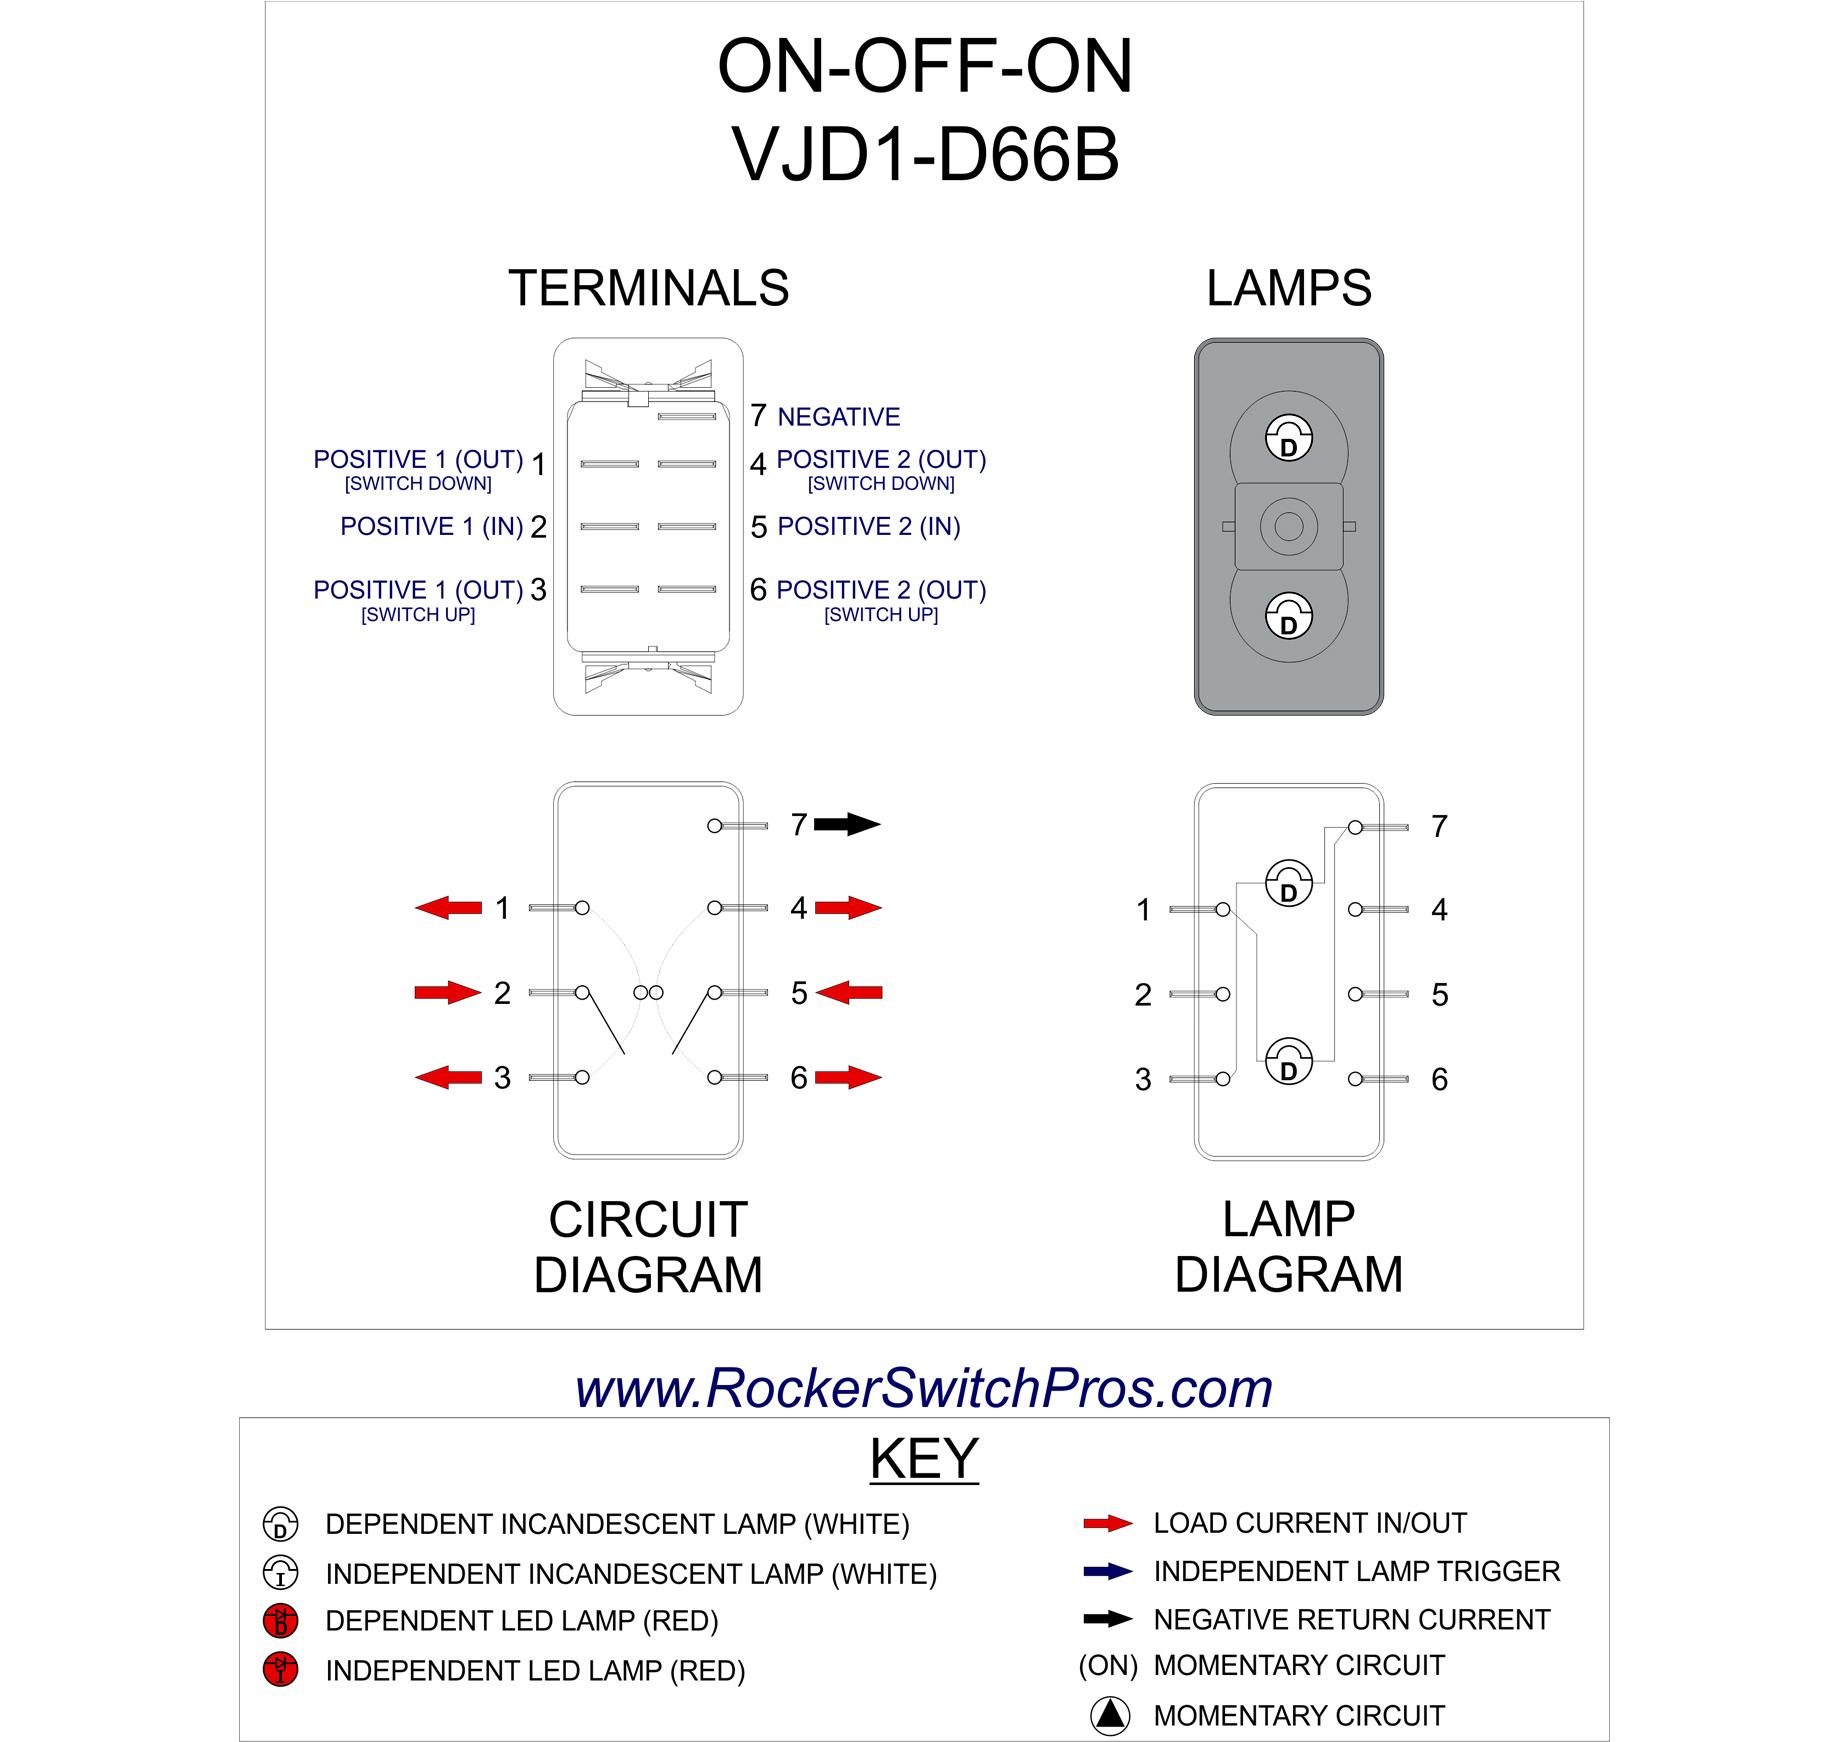 werma signaltechnik wiring diagram eaton transfer switch wiring diagram collection | wiring ...